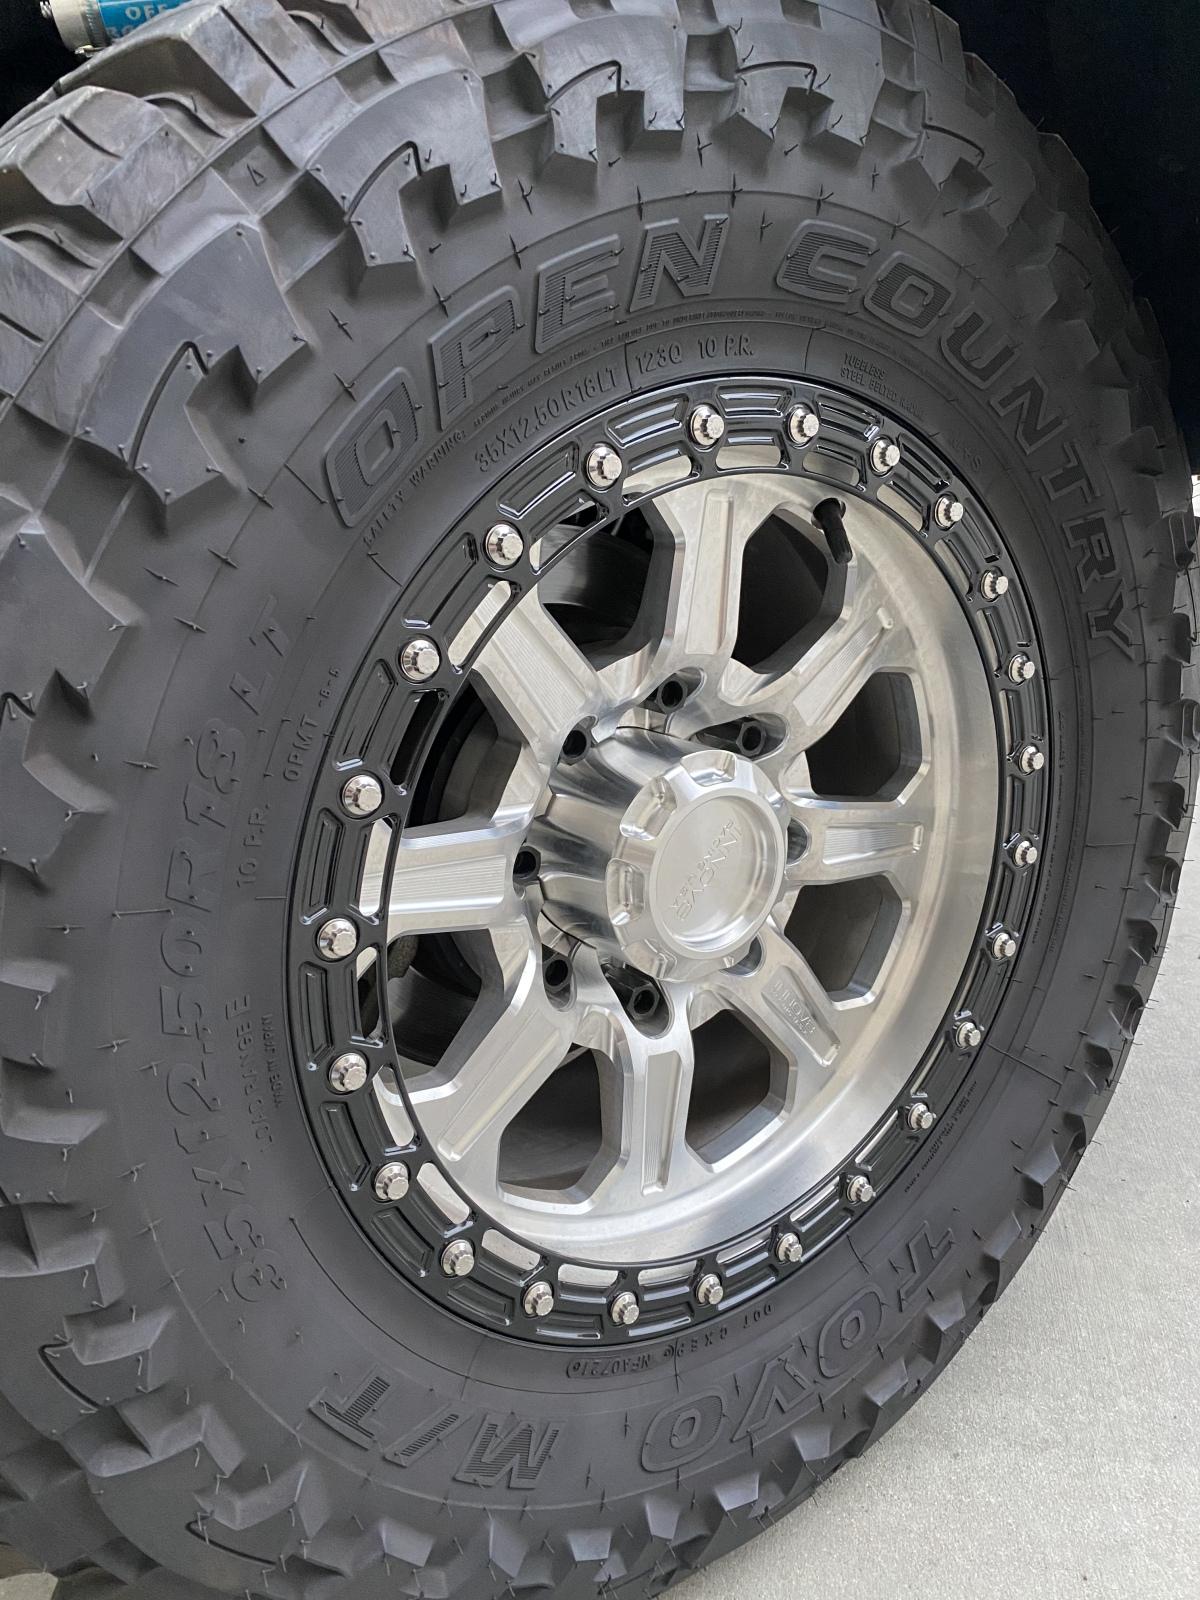 For Sale: 2018 GMC 2500 Denali 4x4 Diesel Leveled w/ Cognito, King Shocks & Innov8 Wheels - photo5